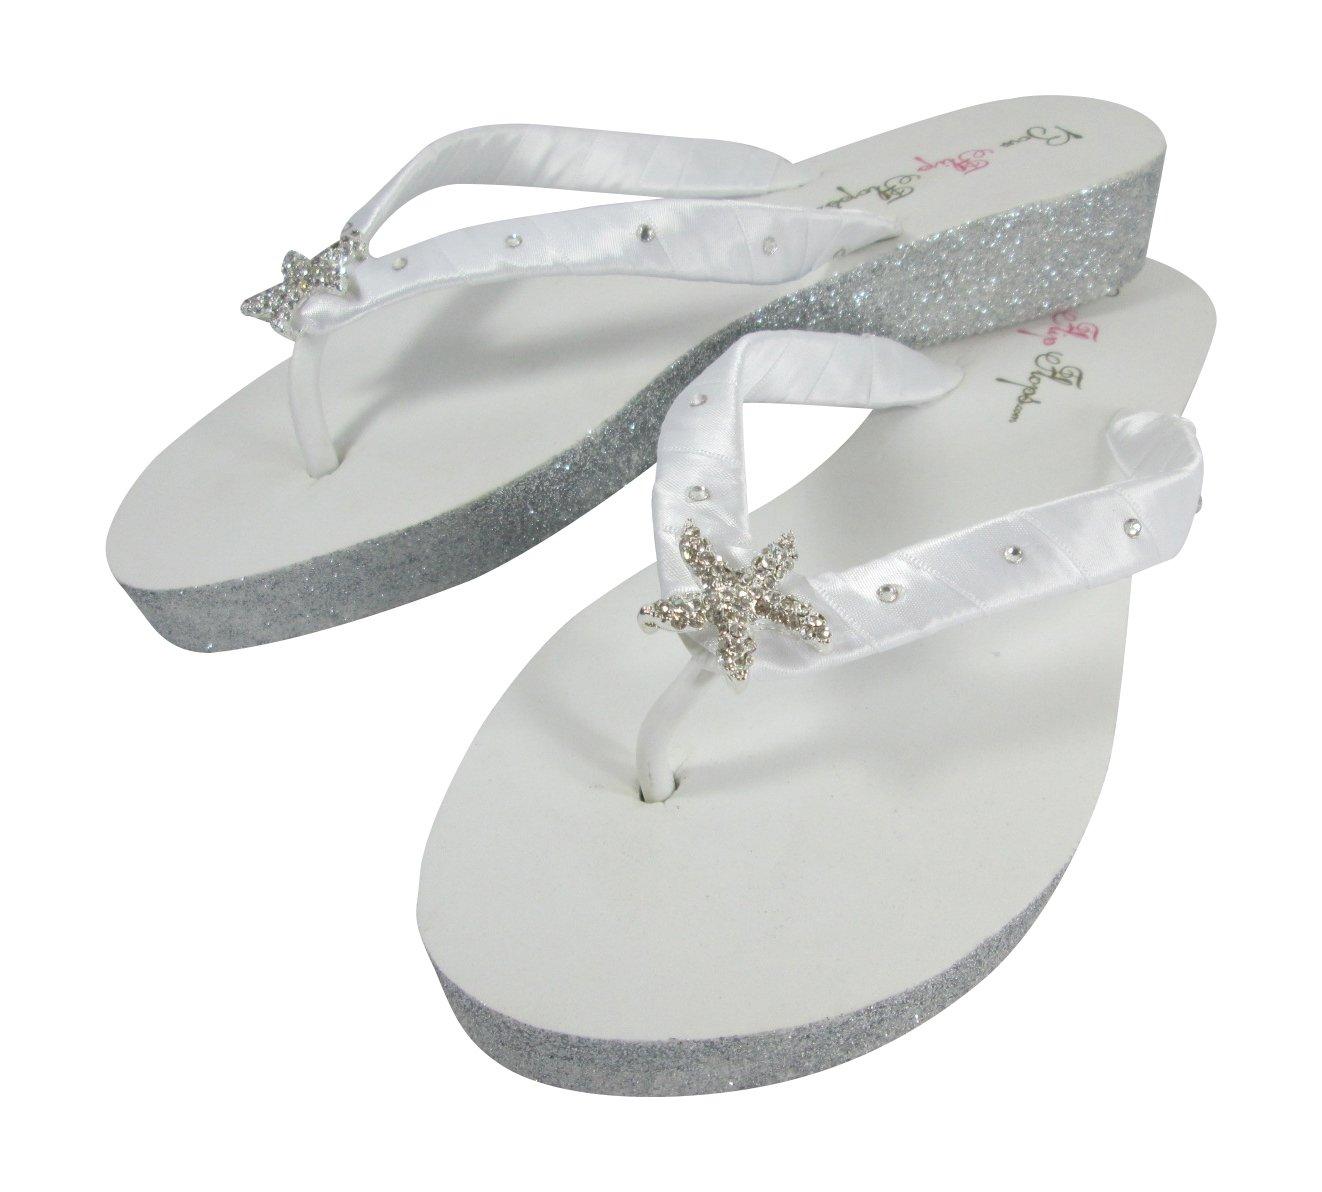 c491099c4e635 Amazon.com  White Starfish Swarovski Rhinestone Glitter Wedge Flip Flop  Bridal Wedding Heel